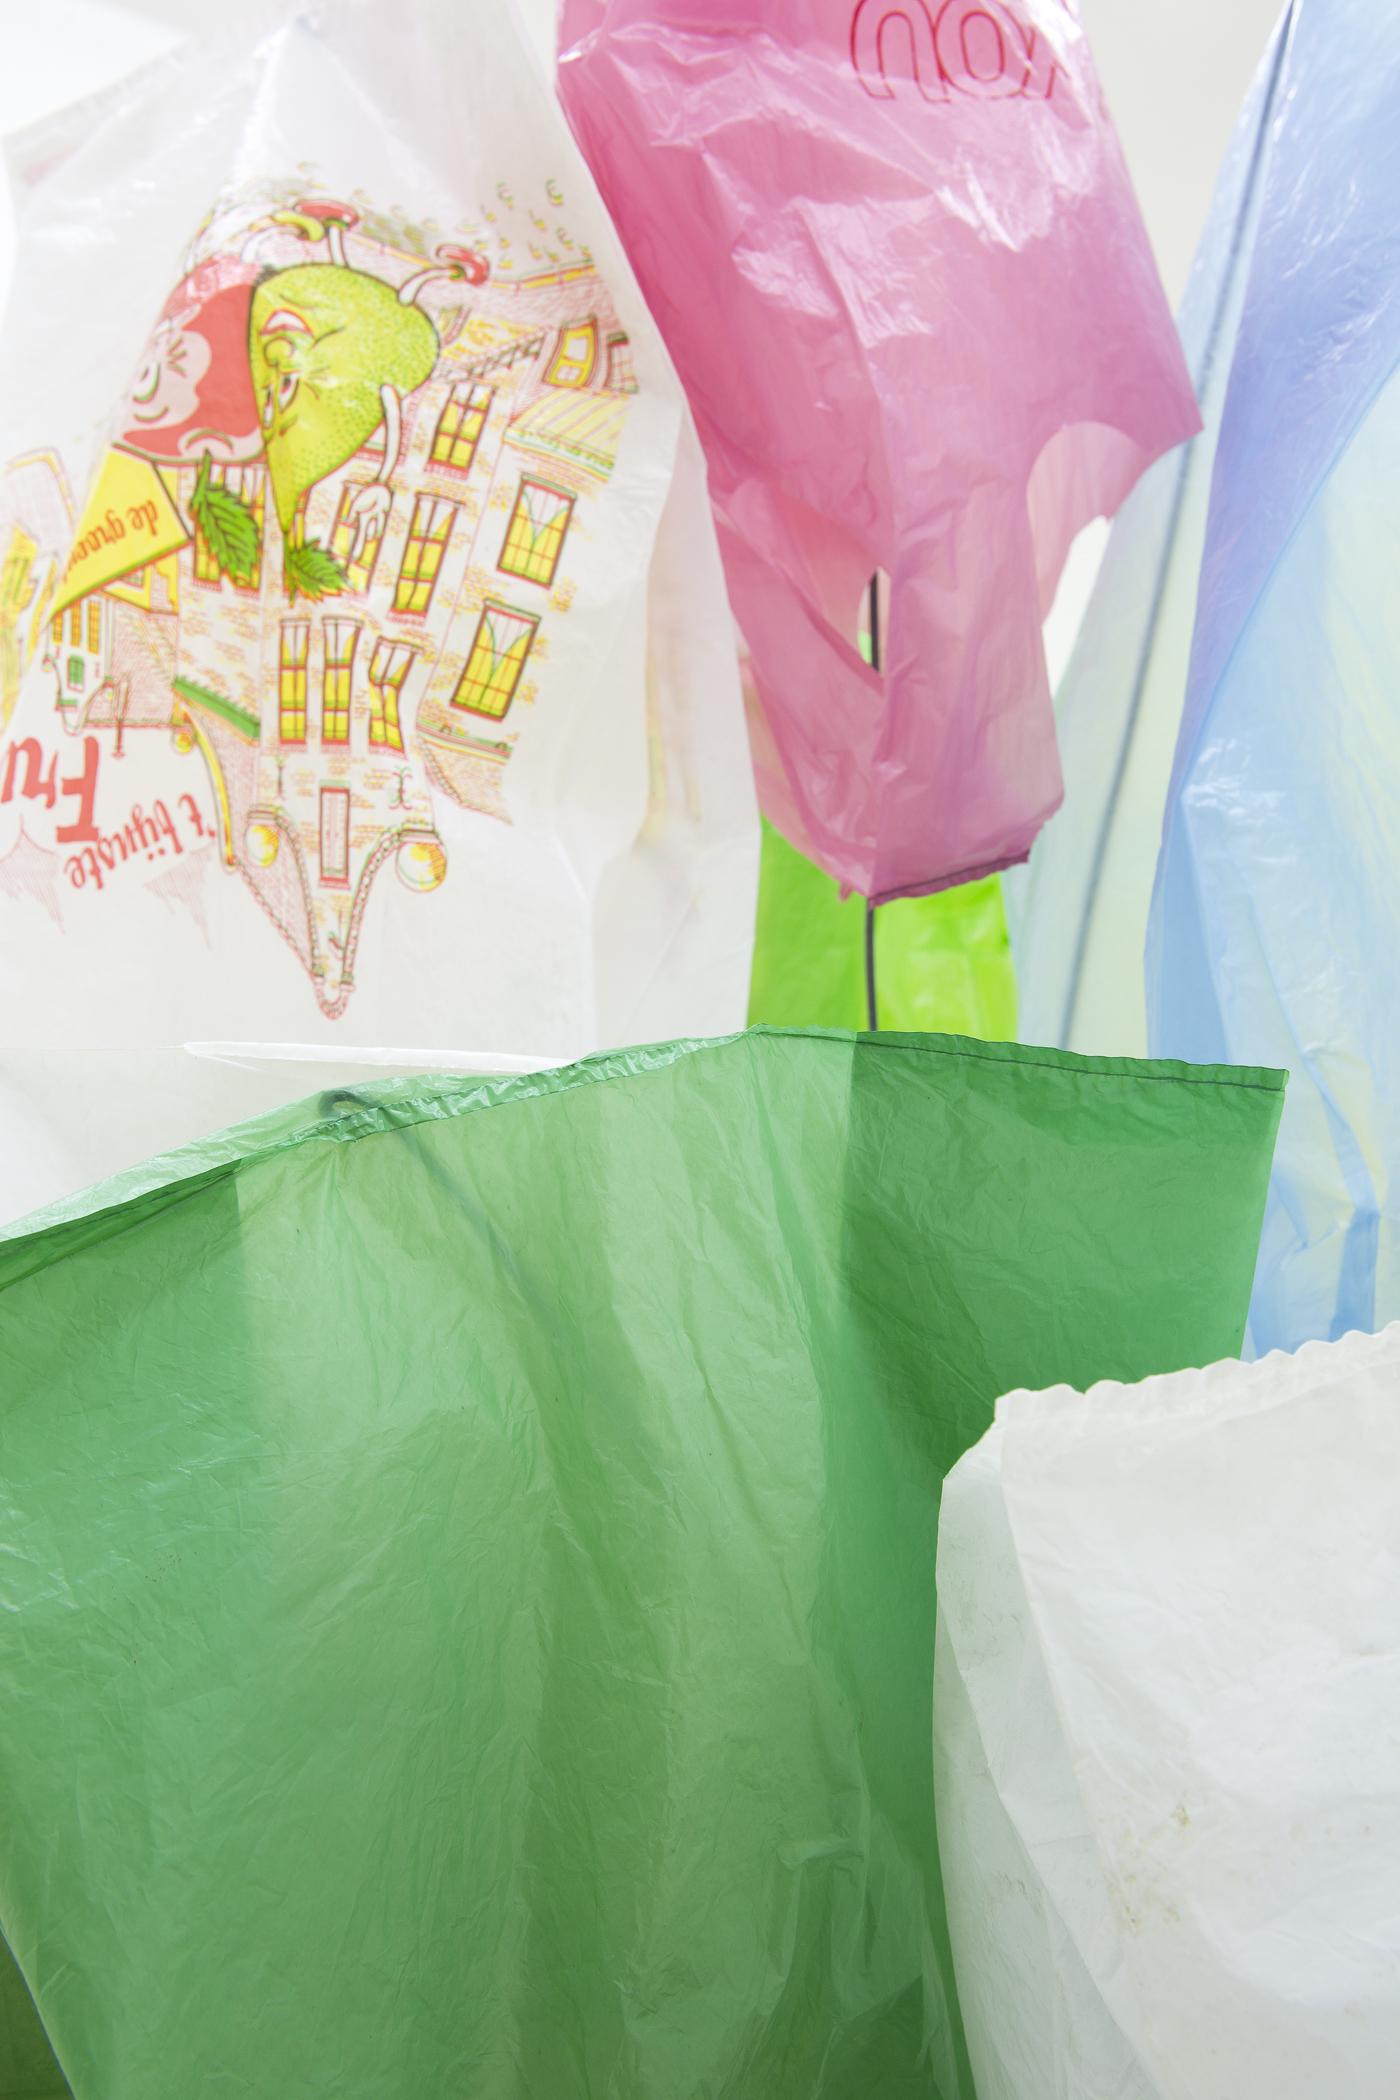 Bunch #4, 1996, Metal, wood, wire, enamel paint, plastic bags, ca. 250 cm high (Detail)